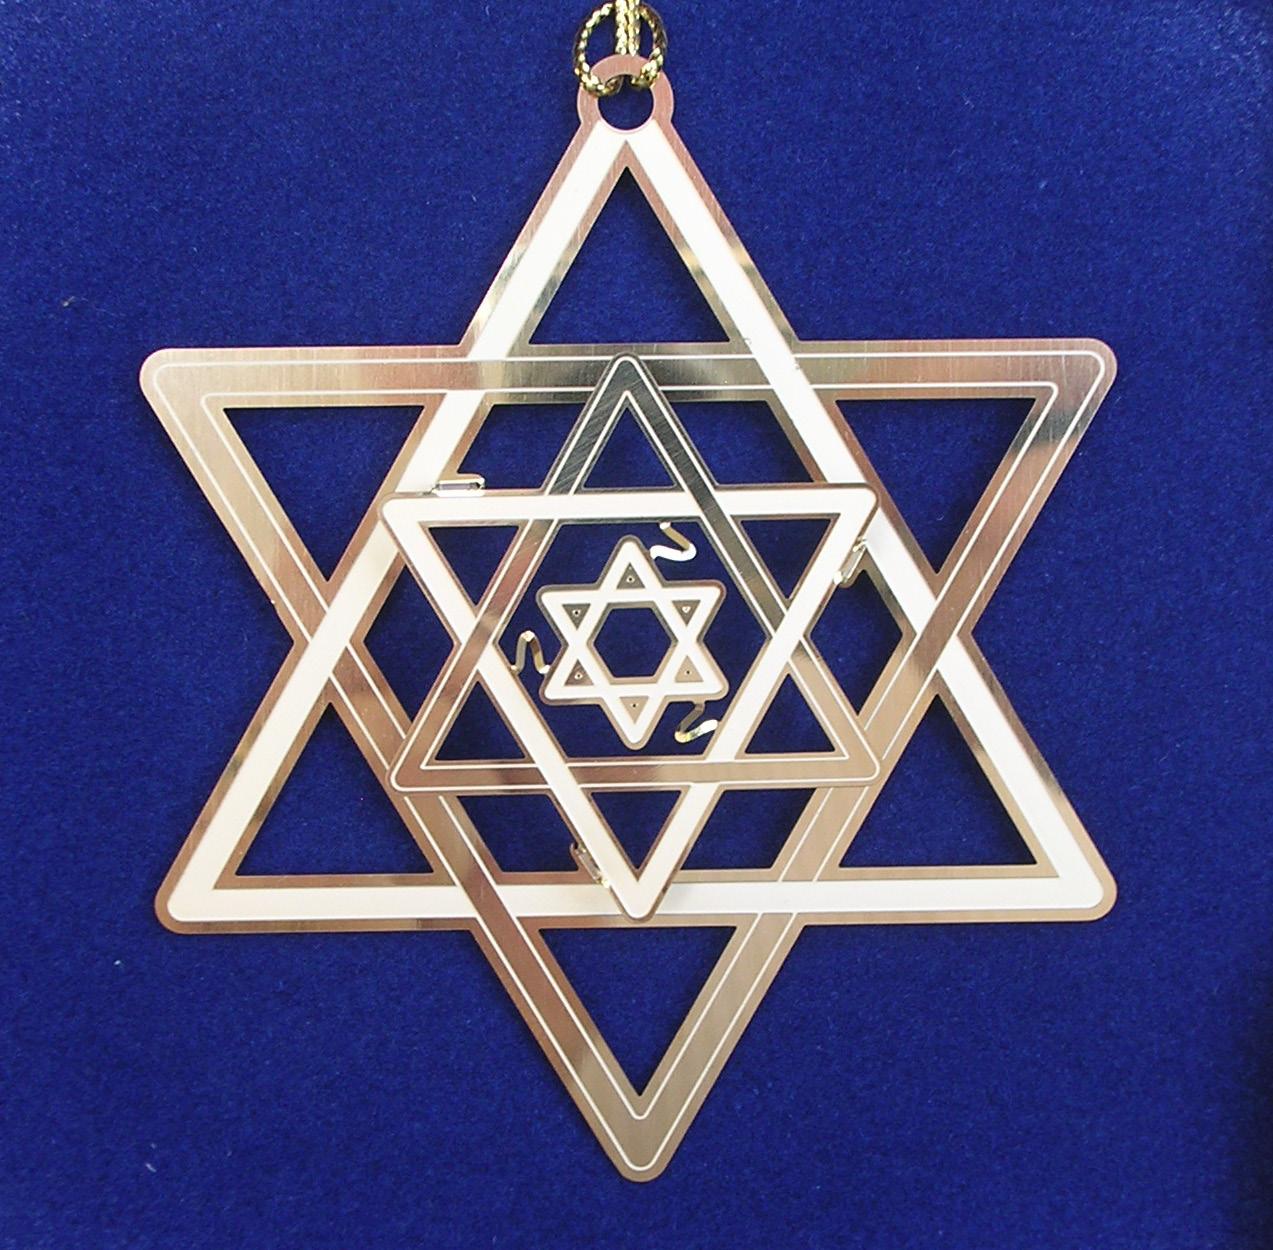 The Jewish Star Of David